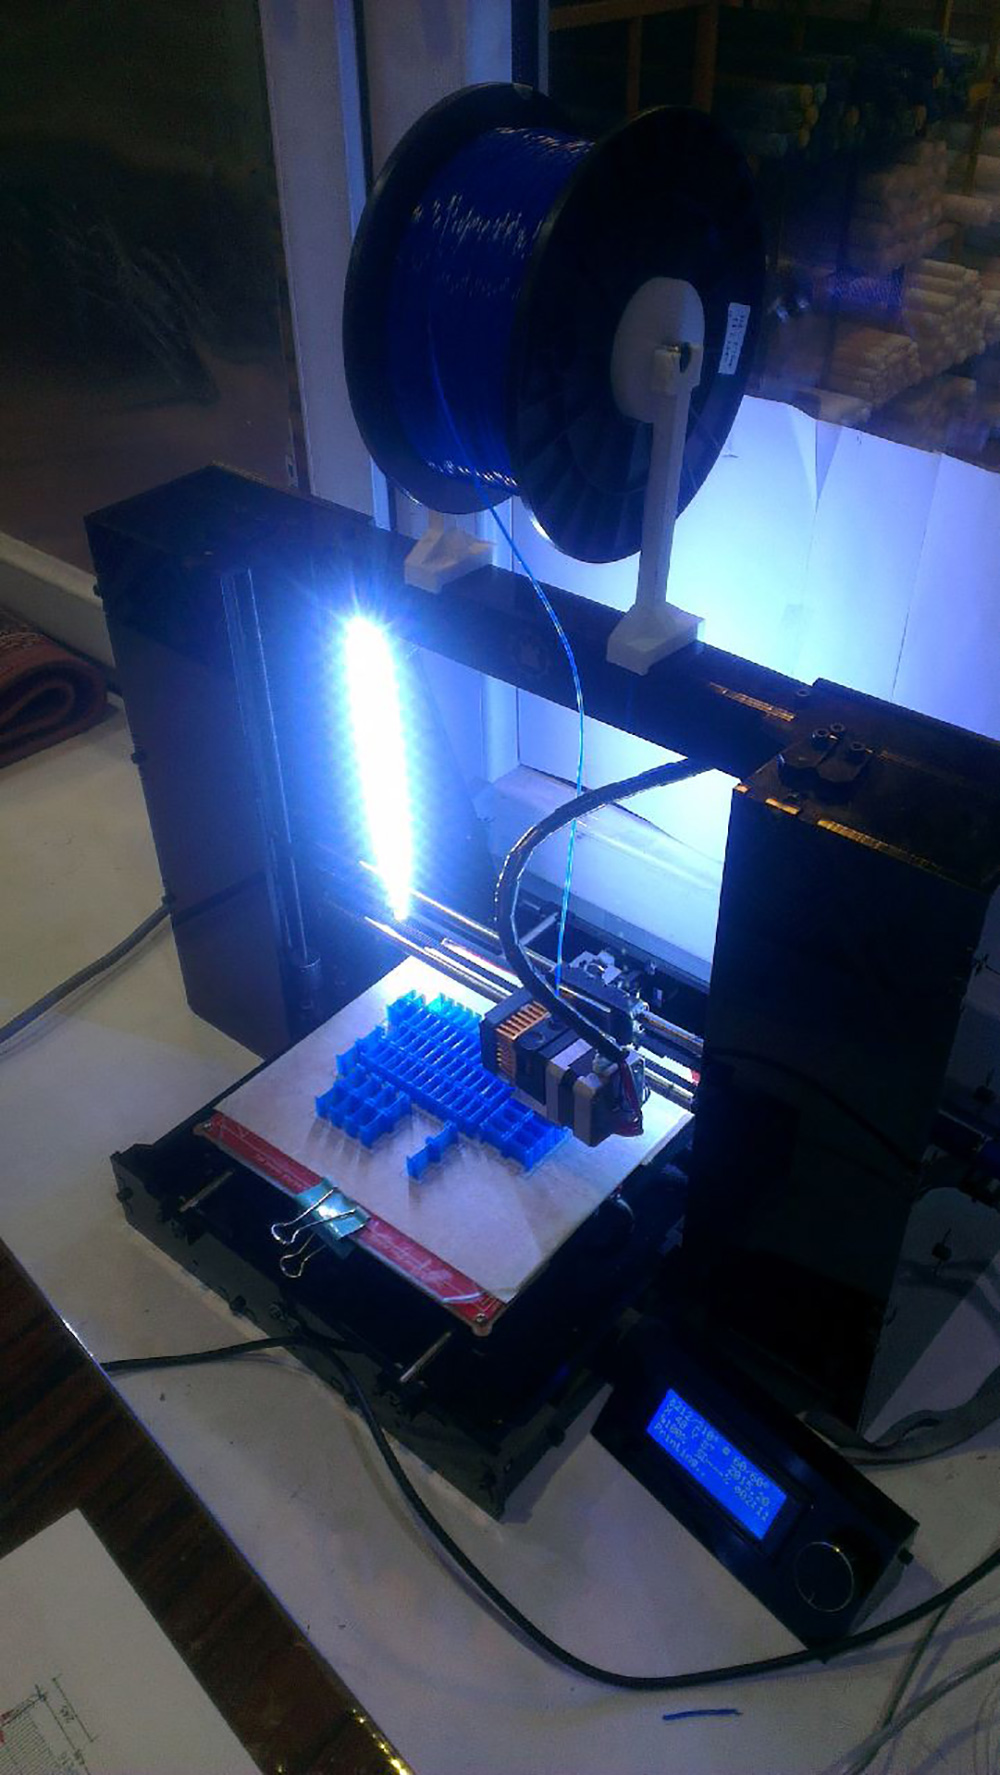 ارائه خدمات چاپ سه بعدی ، کسب و کاری نو